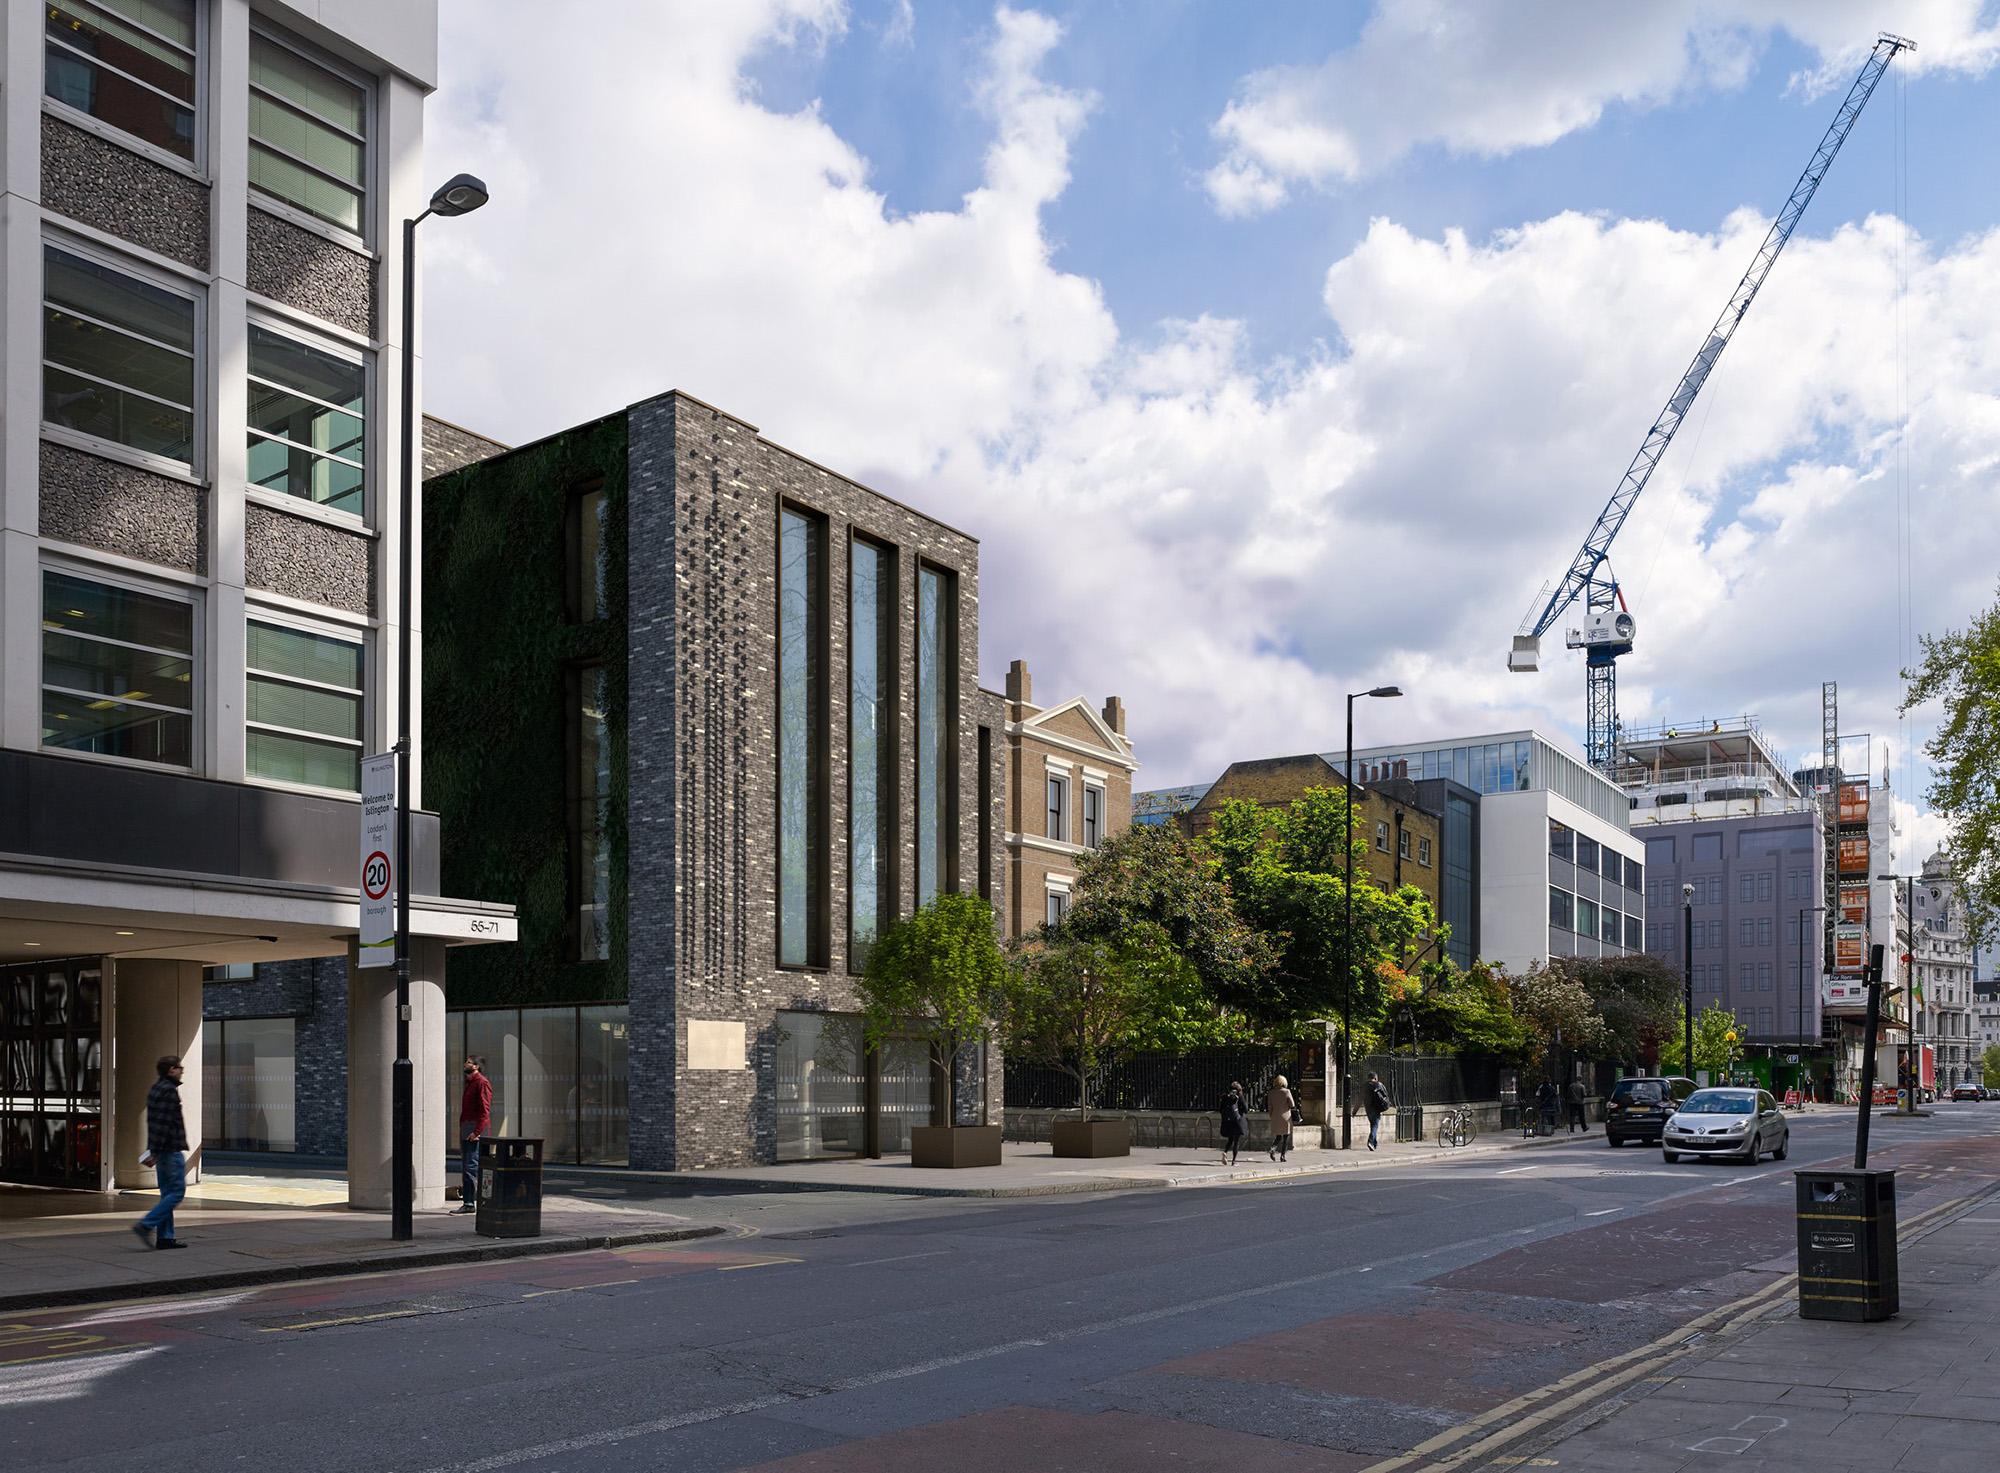 studio-severn-architects-shropshire-riba-uk-08